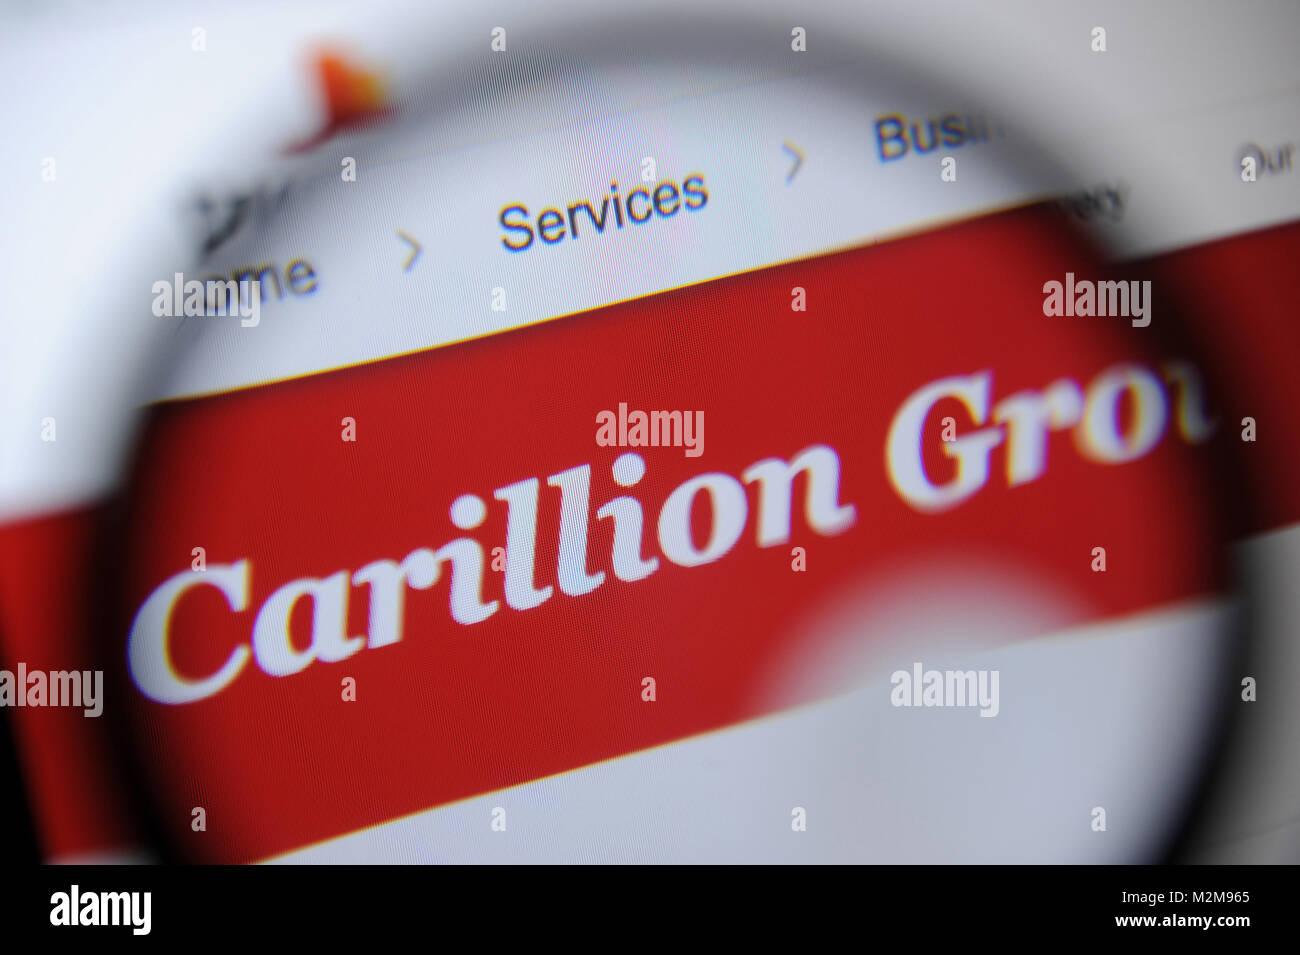 The Carillion Group logo on PWC website - Stock Image